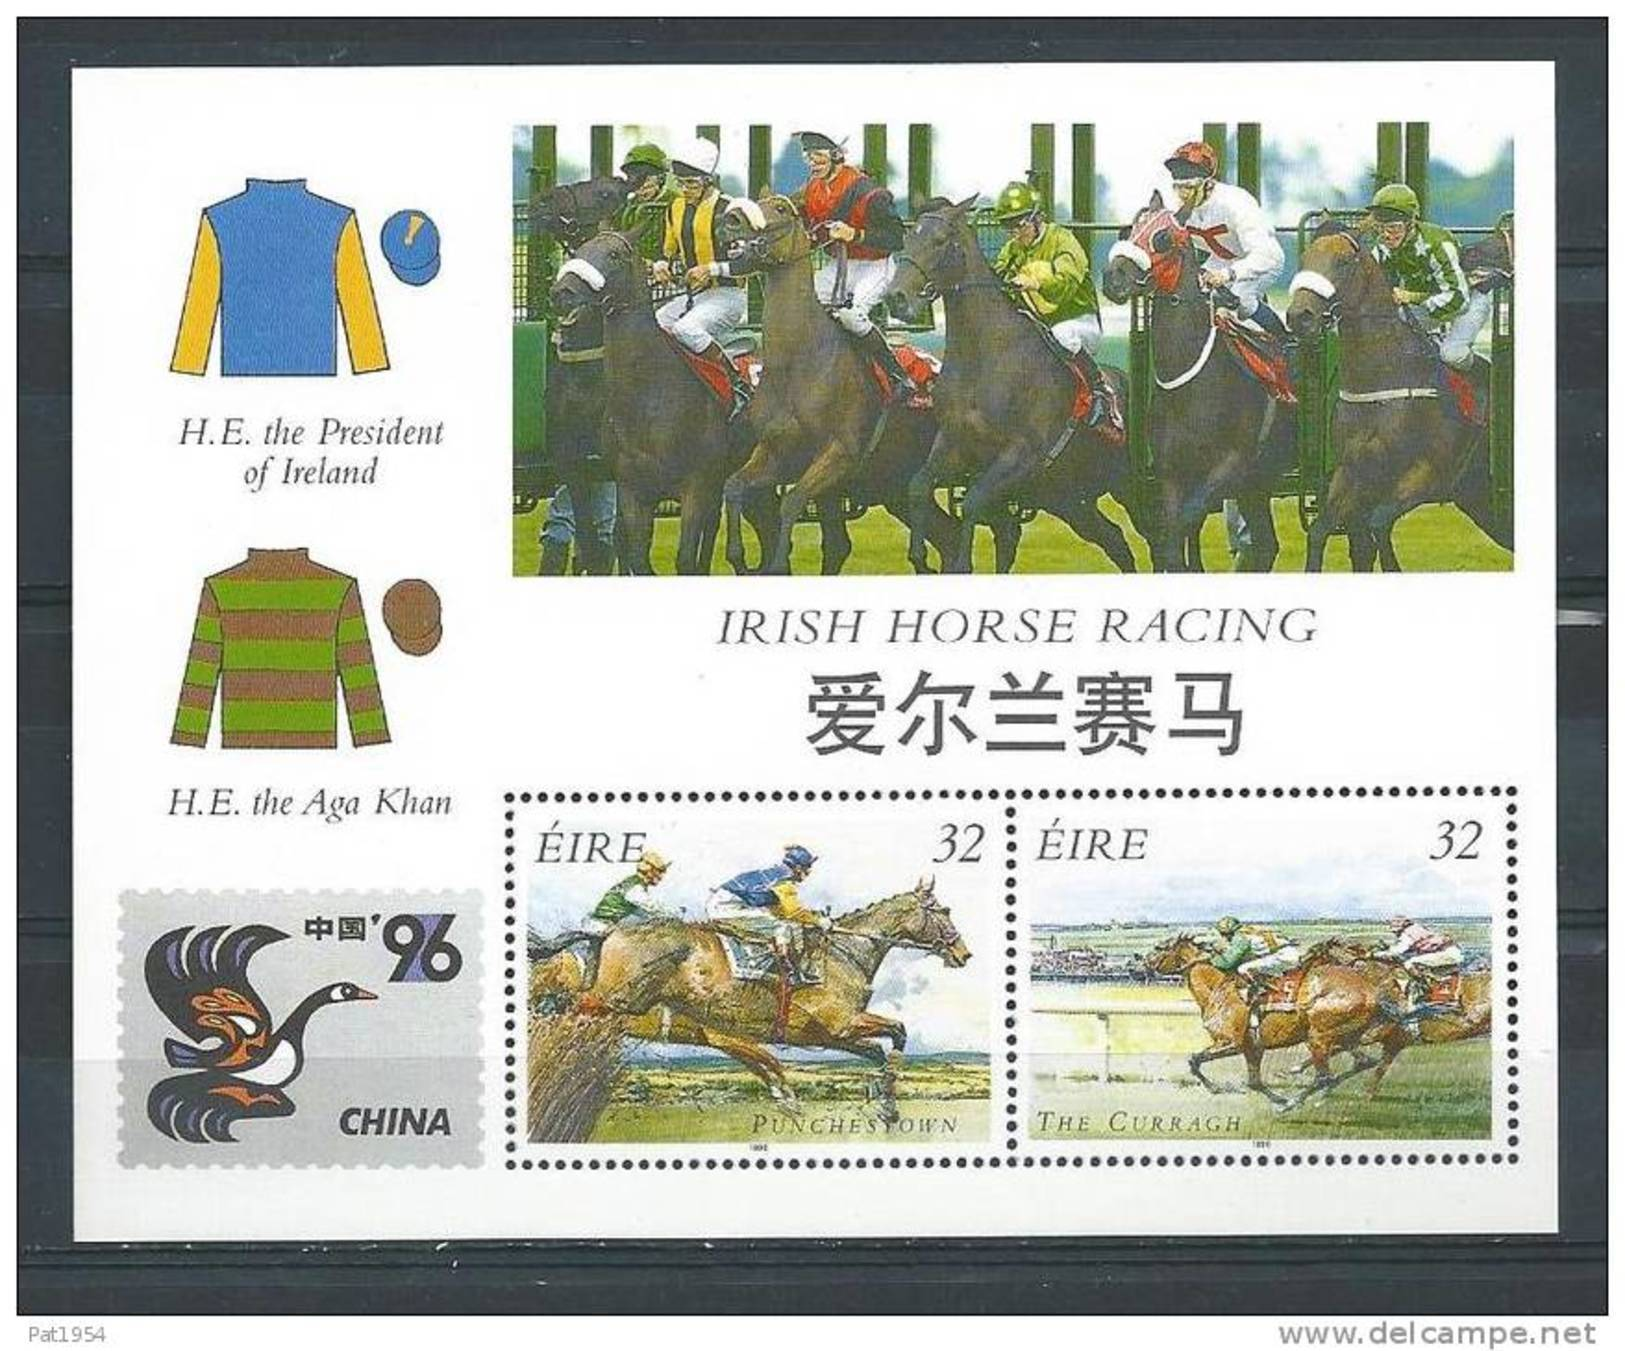 Irlande 1996 Bloc  N°22 Neuf Chine 96 Avec Courses De Chevaux - Blocchi & Foglietti